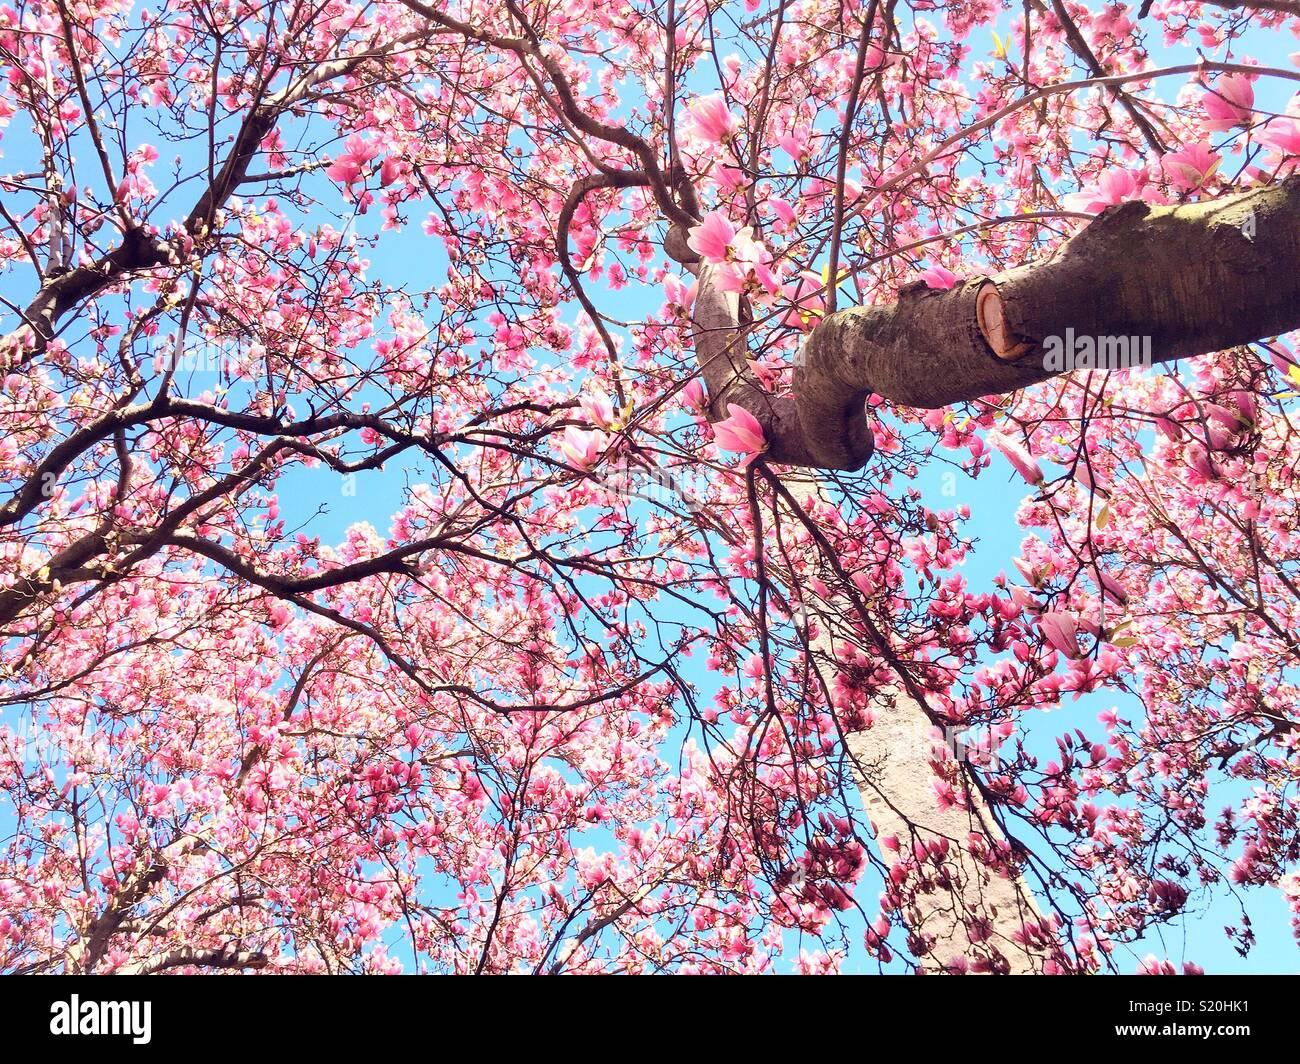 Frühling in Cleopatra's Needle, von Pink Magnolia Blüten umgeben, Central Park, New York City, USA Stockbild